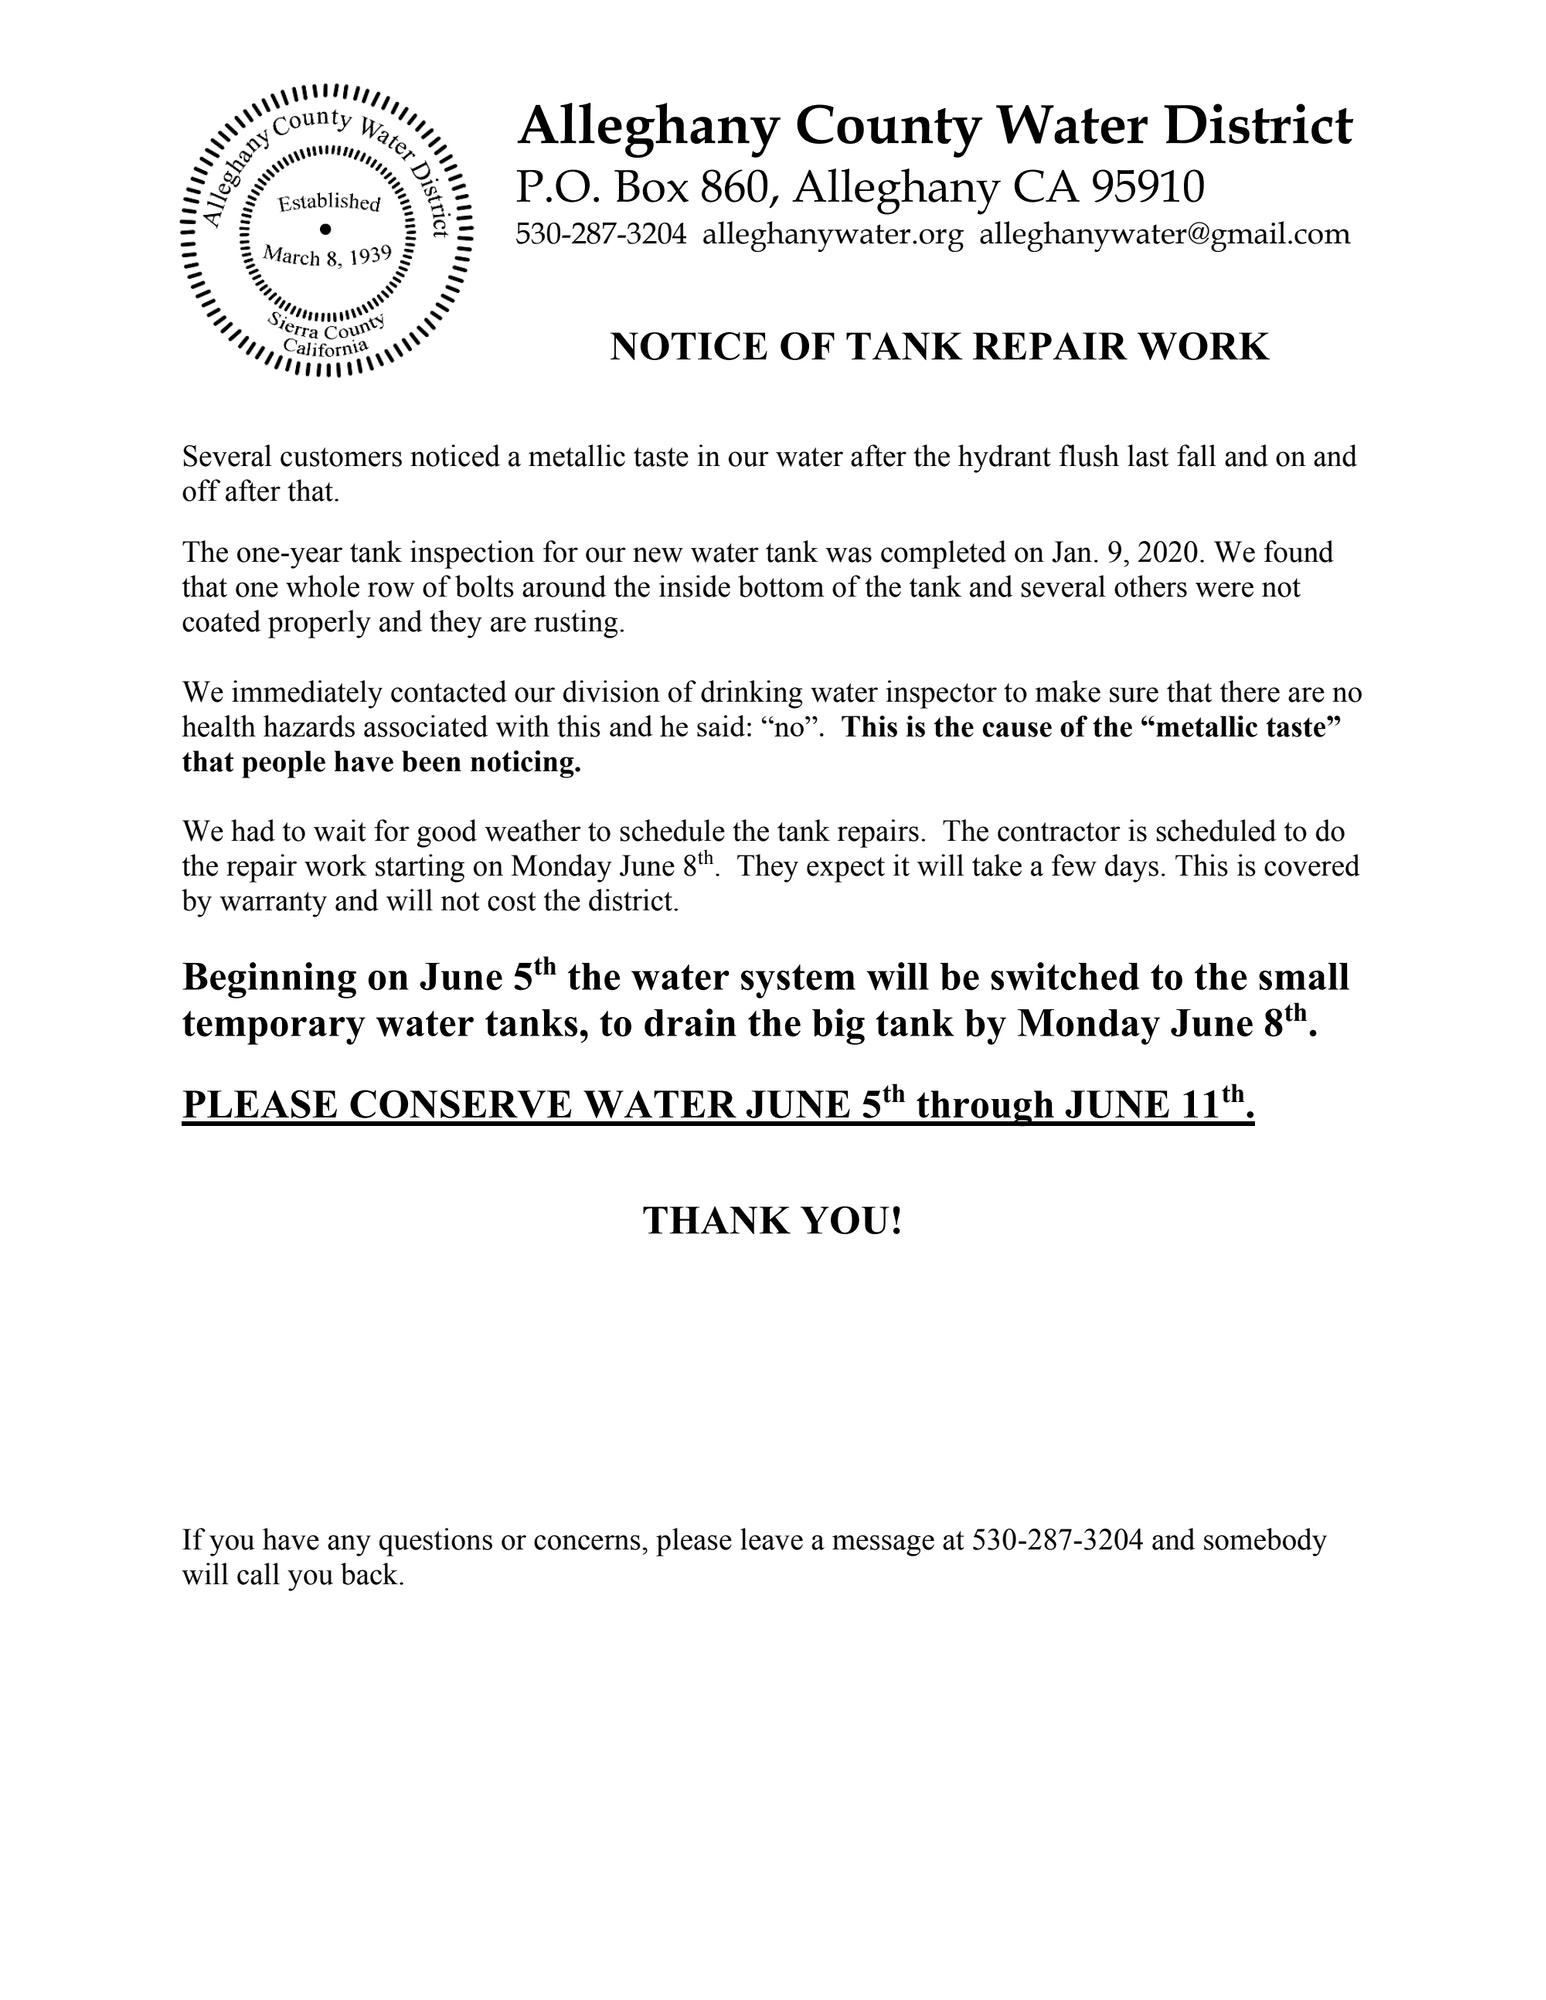 tank repair notice June 2020